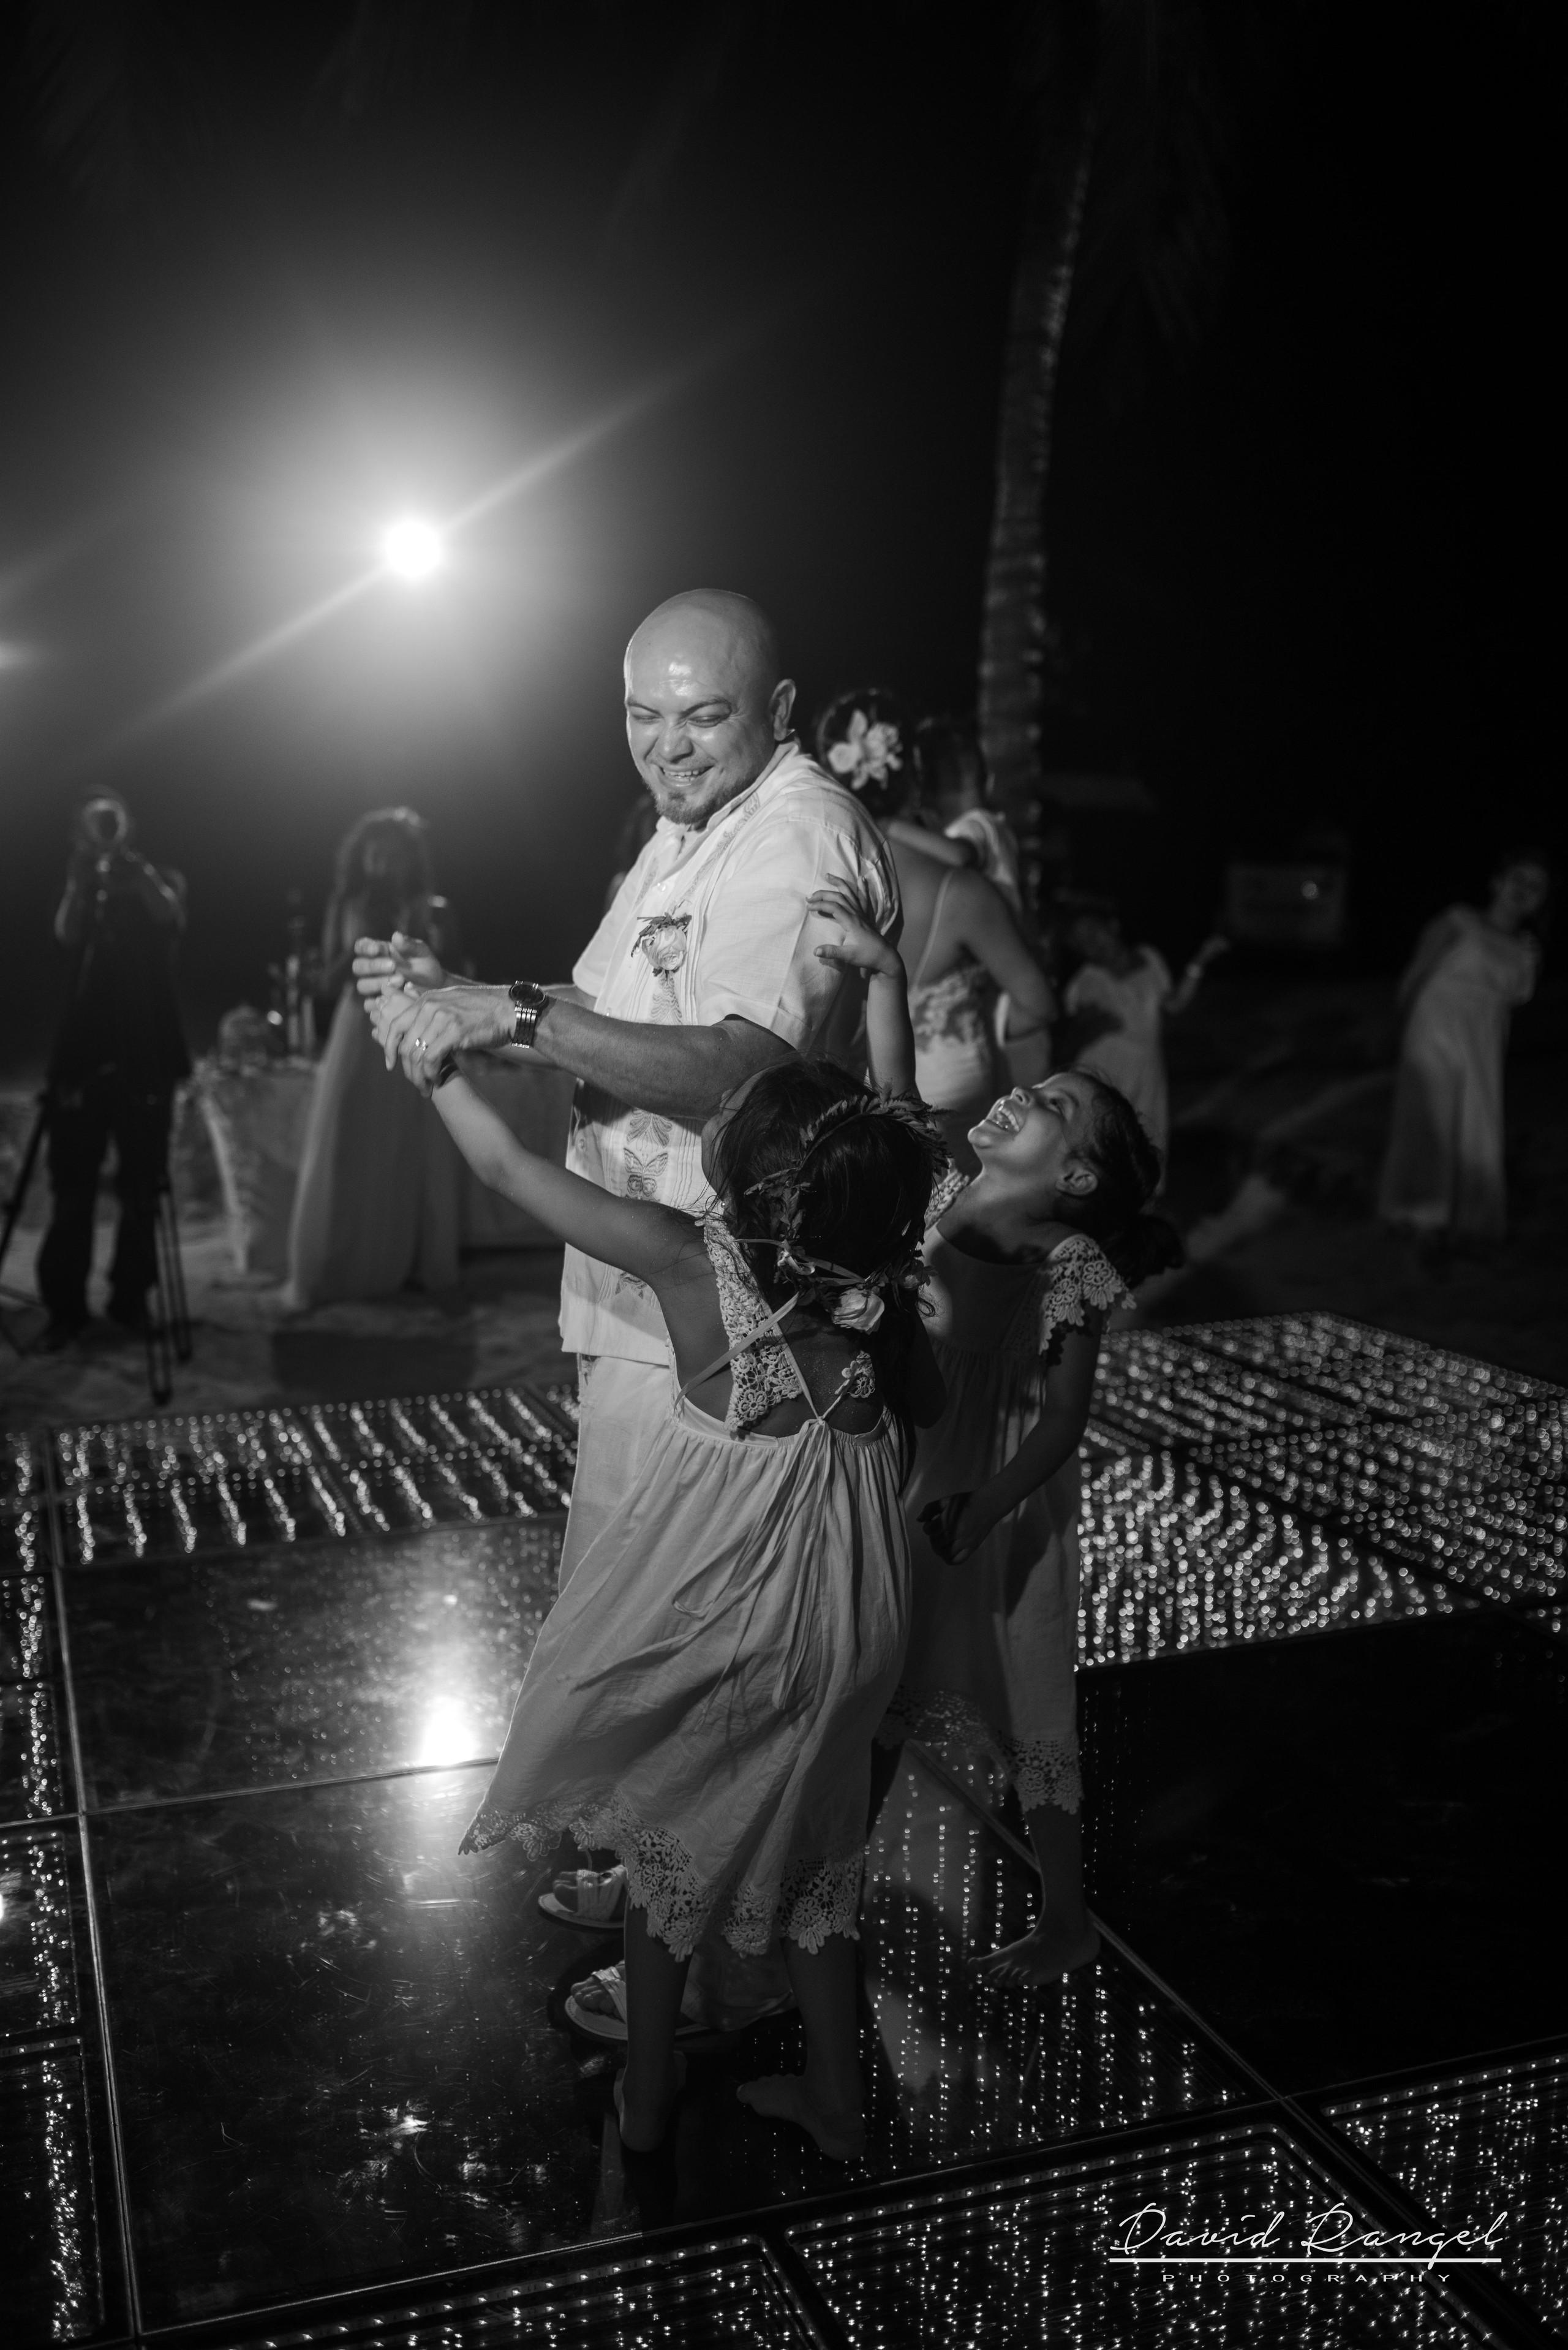 first+dance+occidental+xcaret+venue+dance+floor+bride+groom+love+letters+daugthers